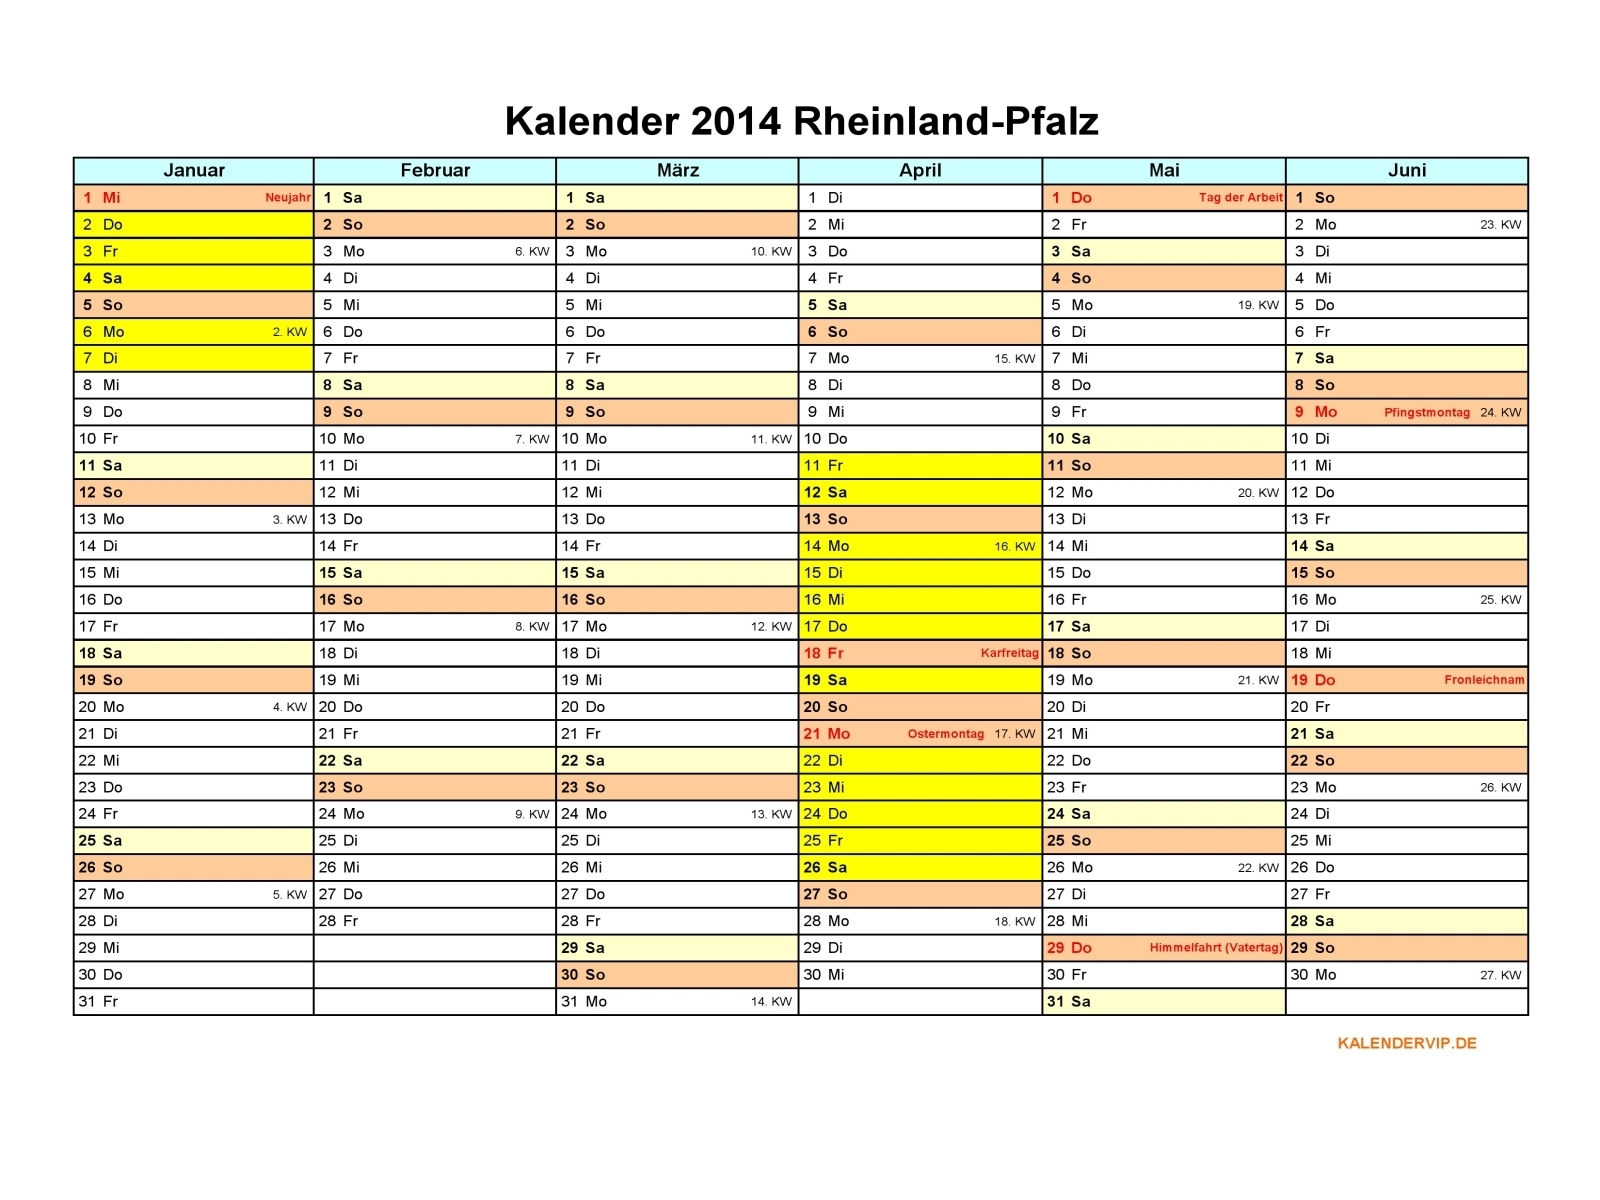 Kalender 2014 Rheinland-Pfalz - KalenderVIP